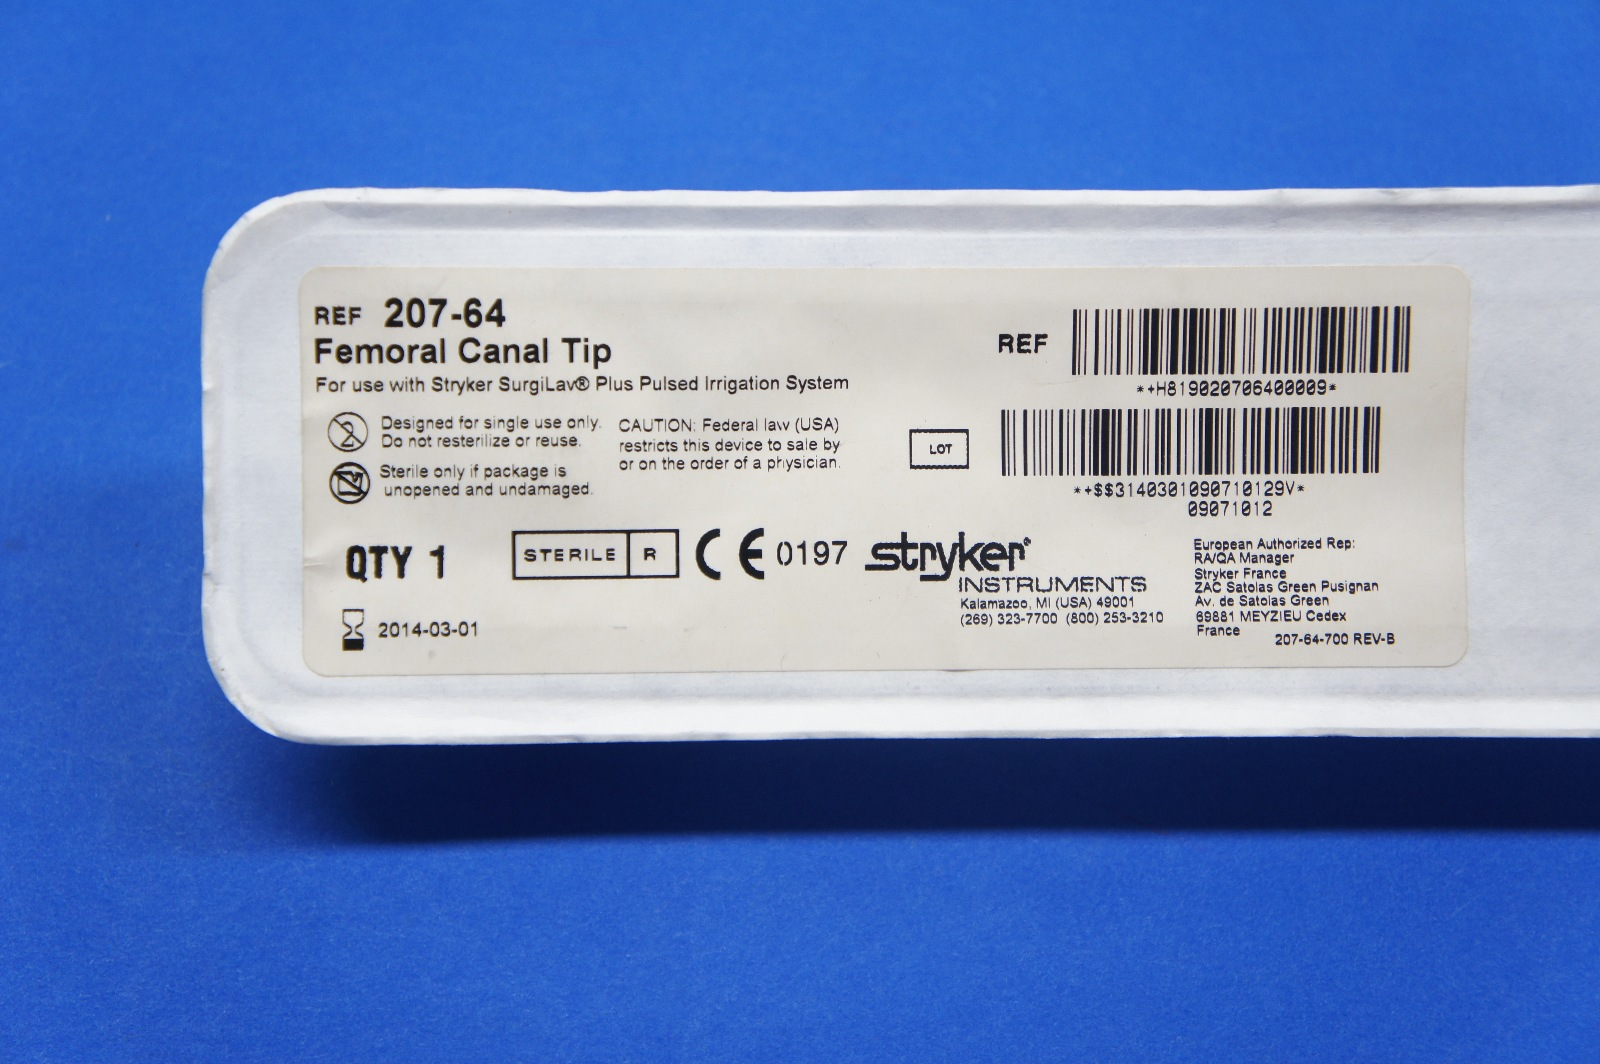 Femoral Canal Tip STRYKER – Marlins Medico